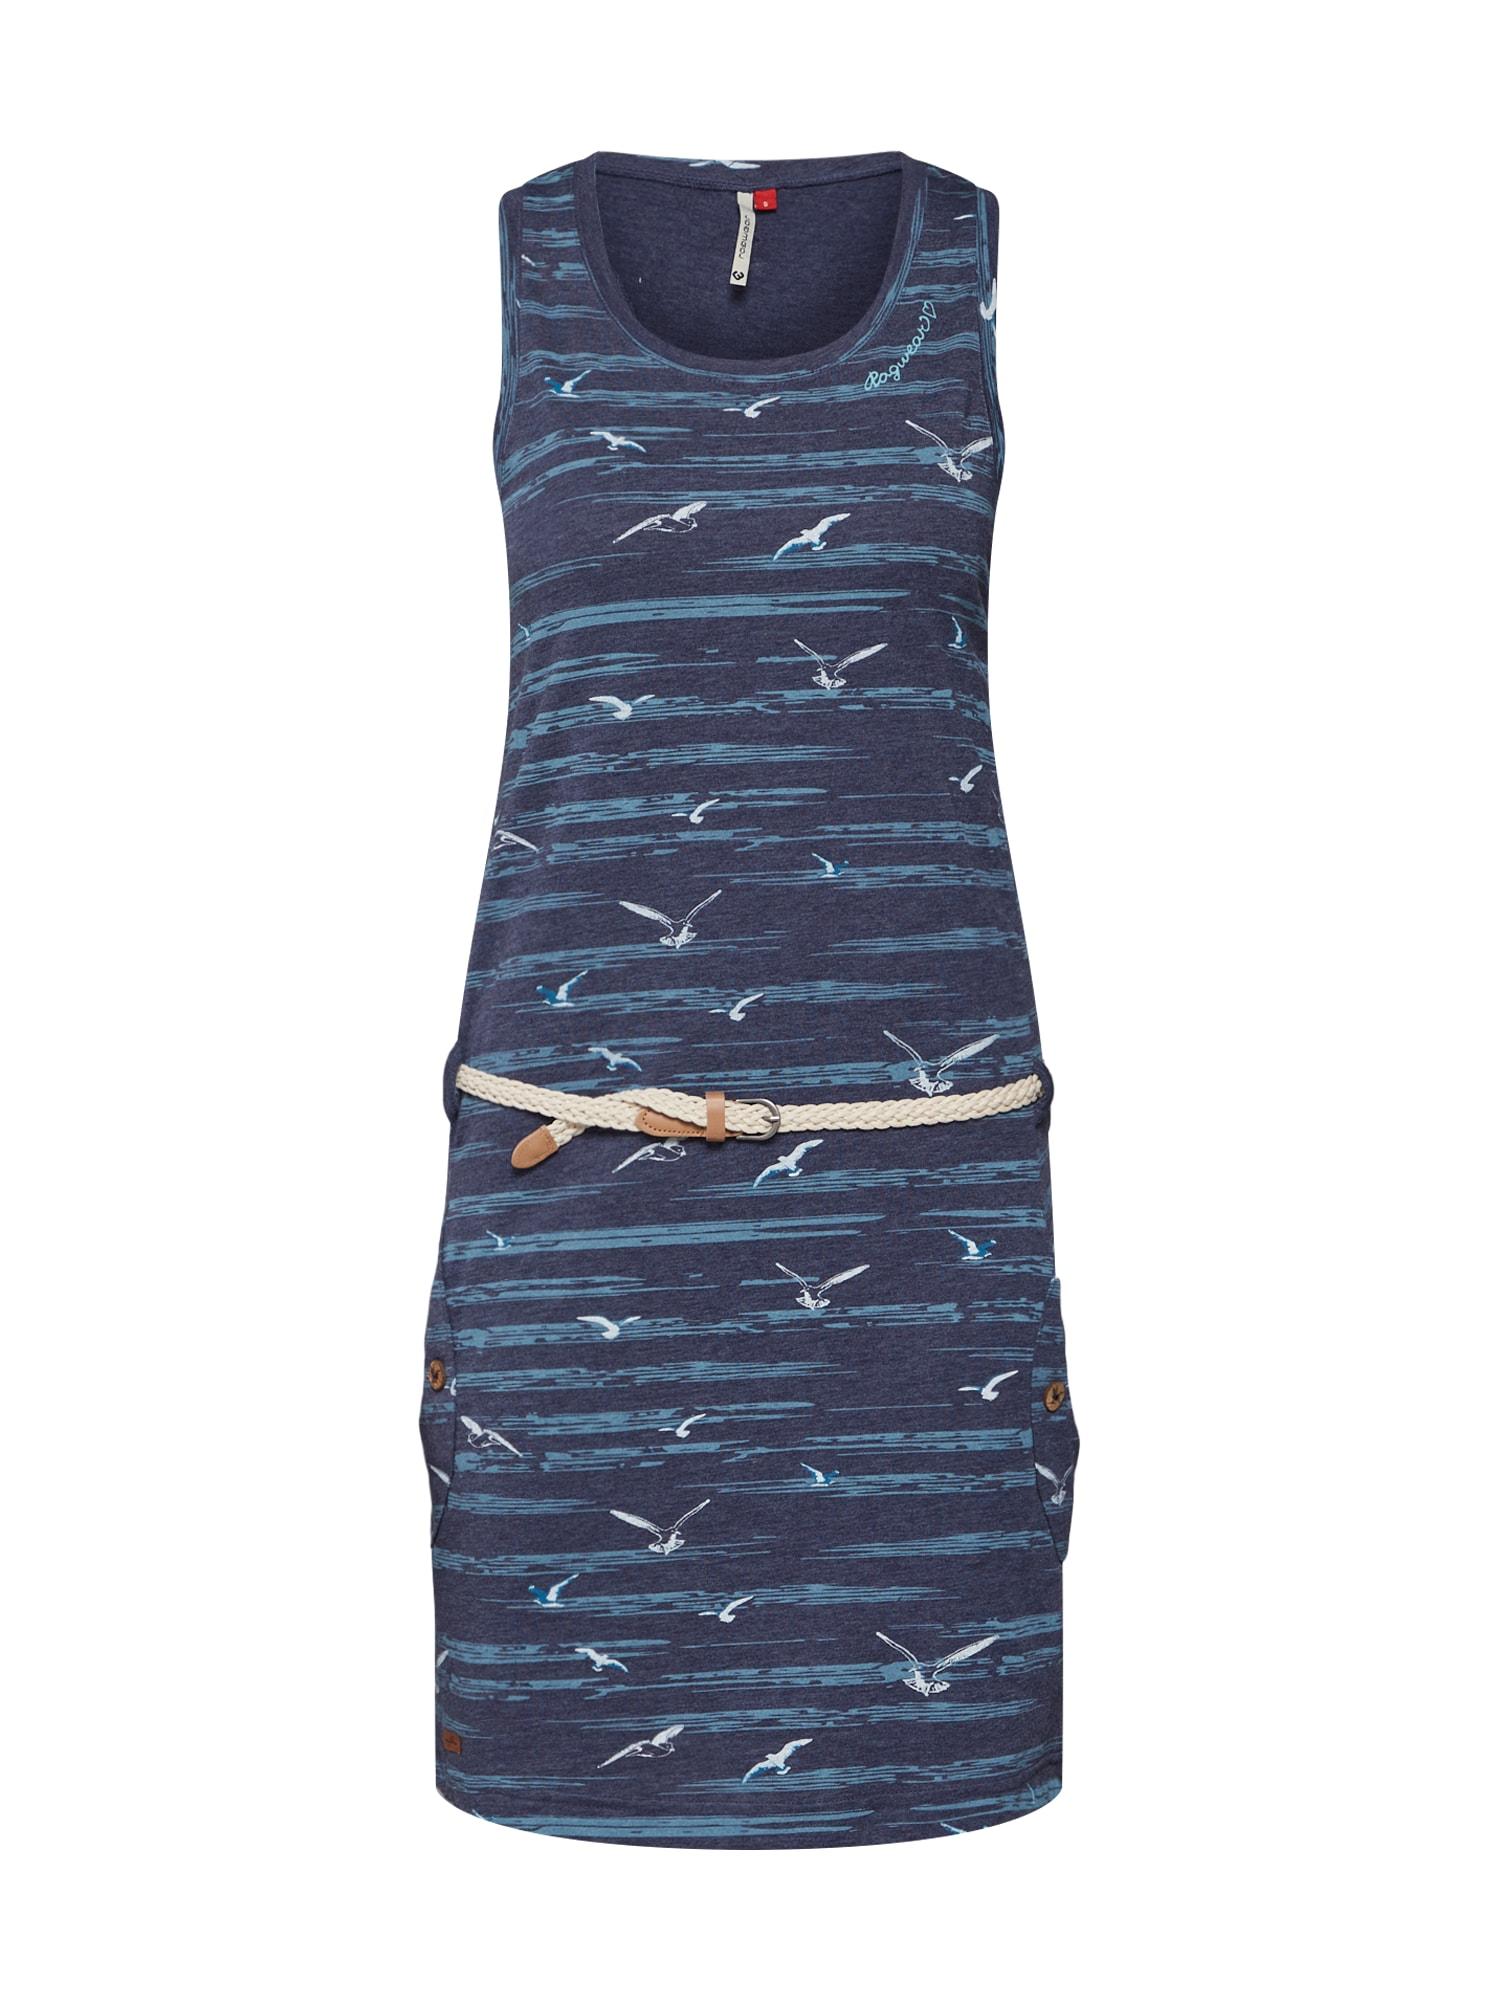 Šaty Kesy námořnická modř šedá Ragwear